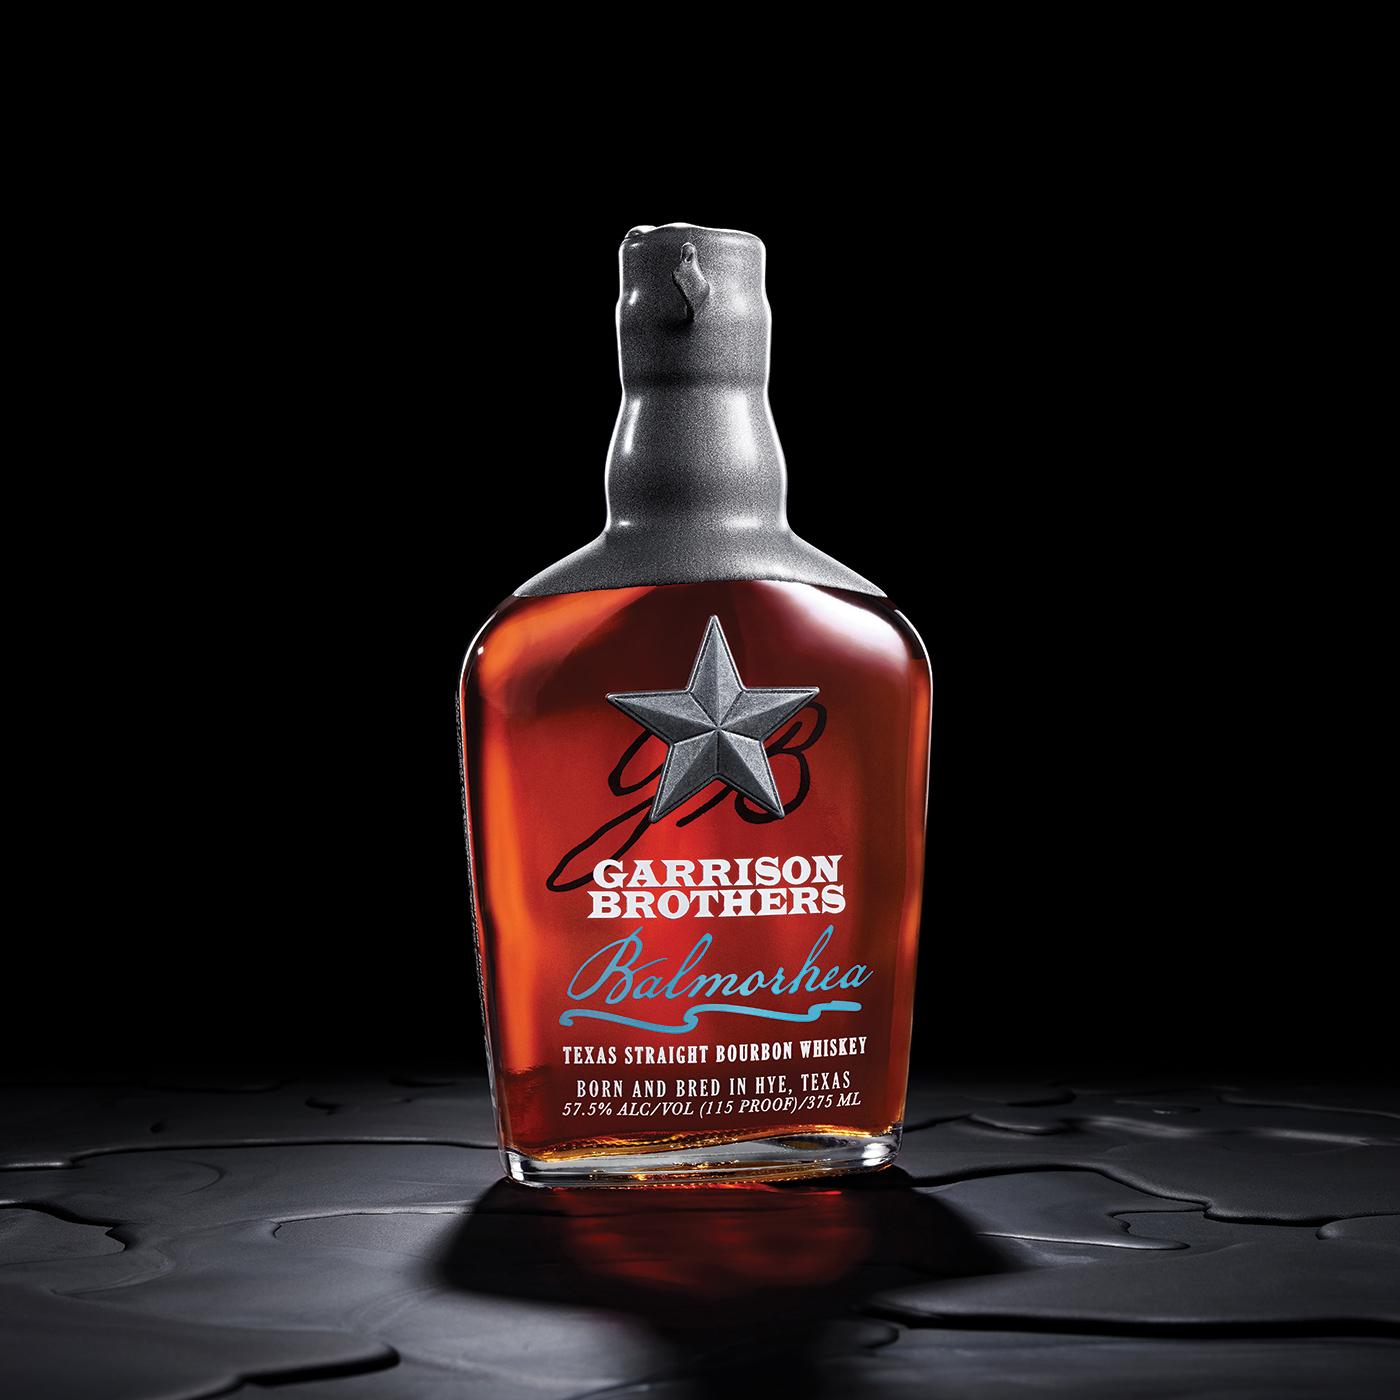 Balmorhea Double Barrel Bourbon (photo credit_ Adam Voorhees Photography)